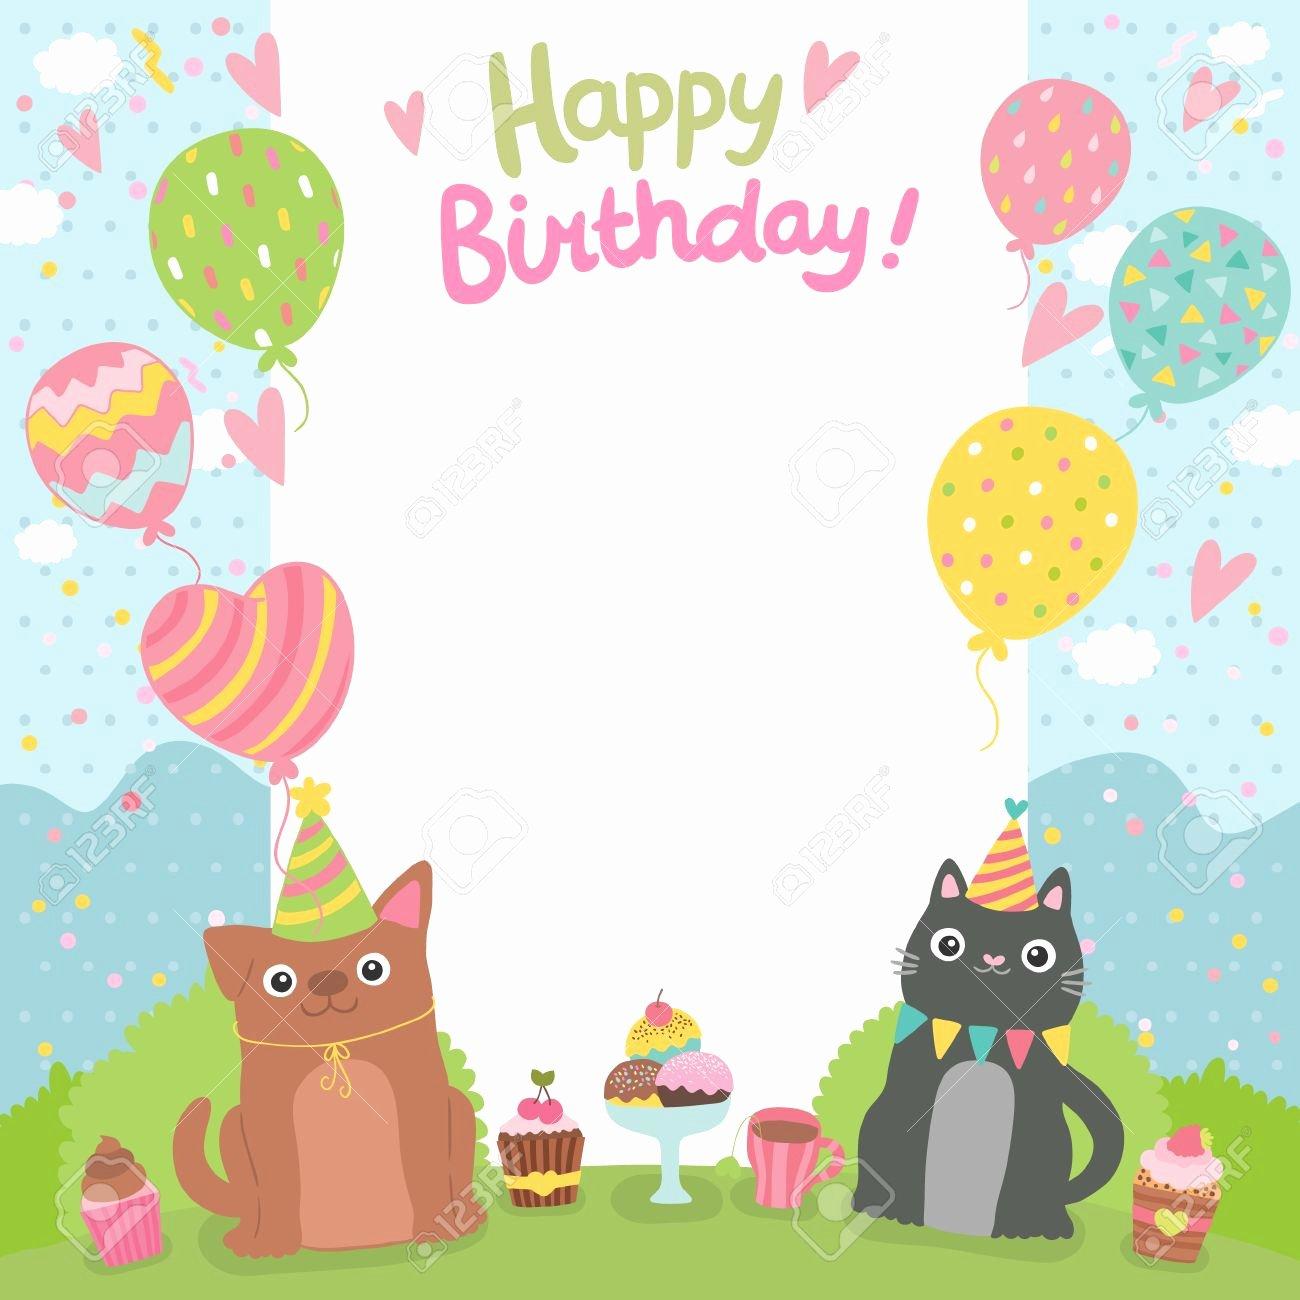 Happy Birthday Card Template Regarding Happy Birthday Card